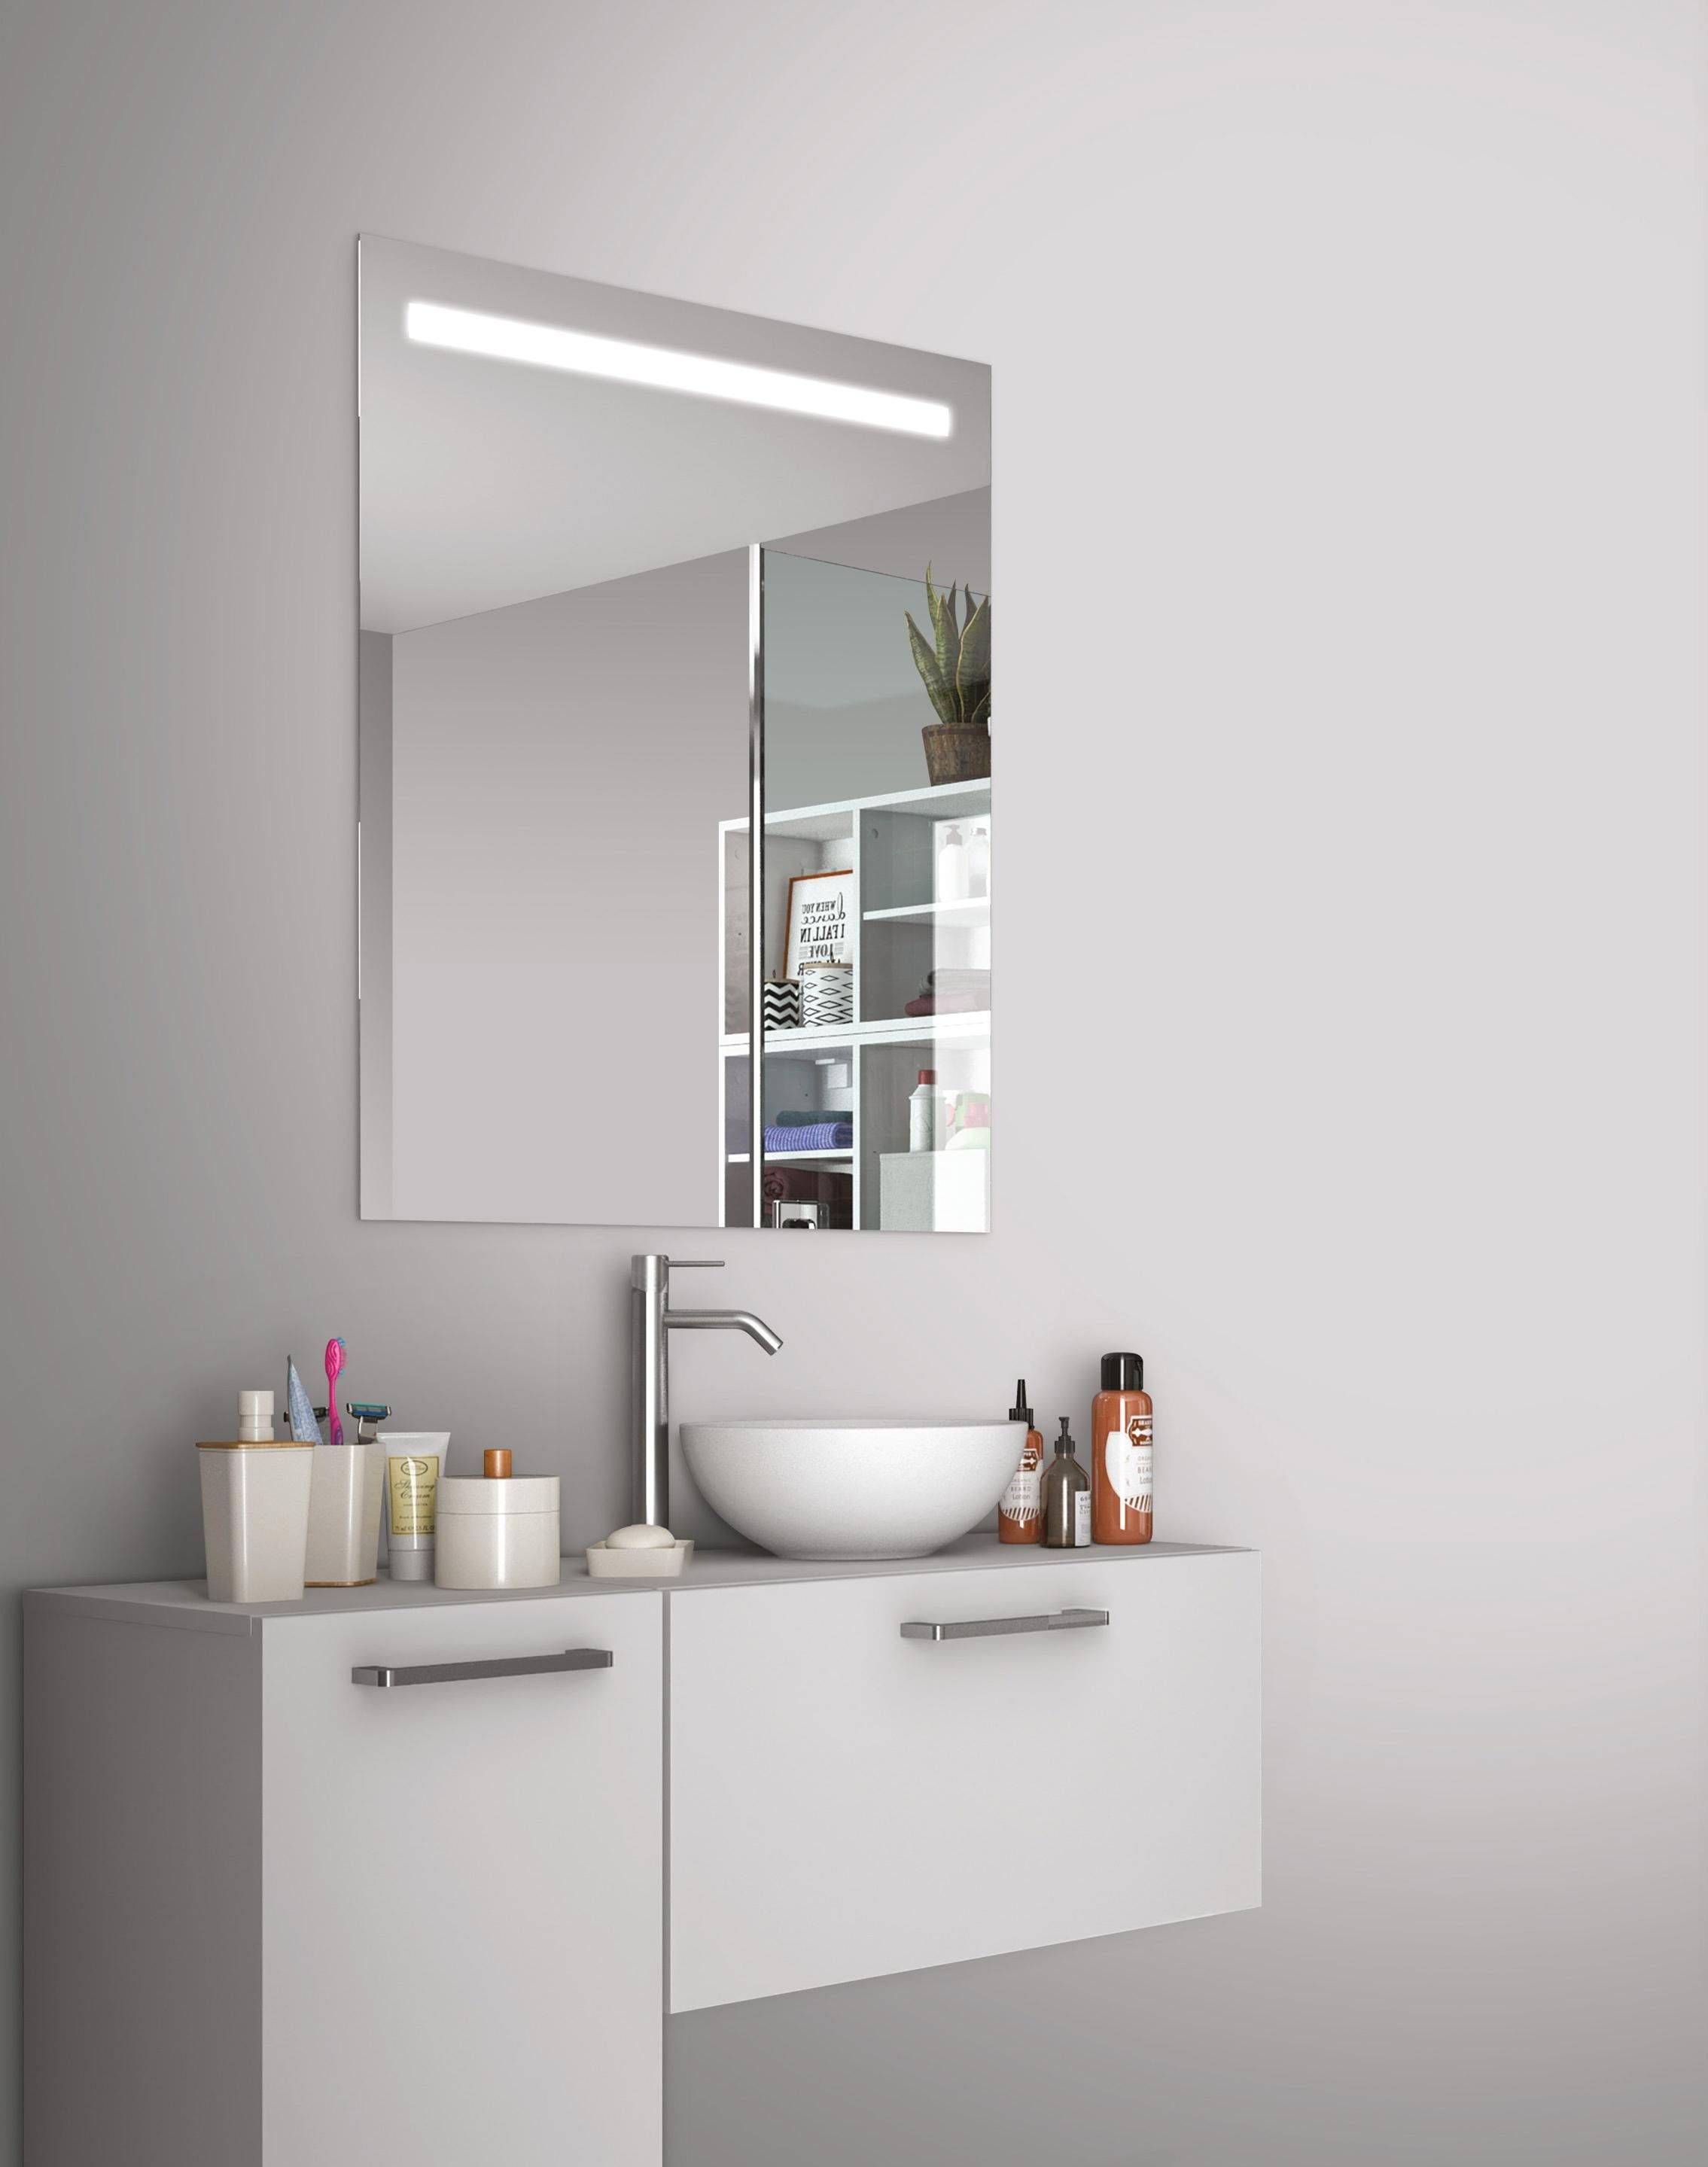 Miroir Lumineux Avec Eclairage Integre L 60 X H 70 Cm Essential Miroir Lumineux Miroir Avec Eclairage Miroir